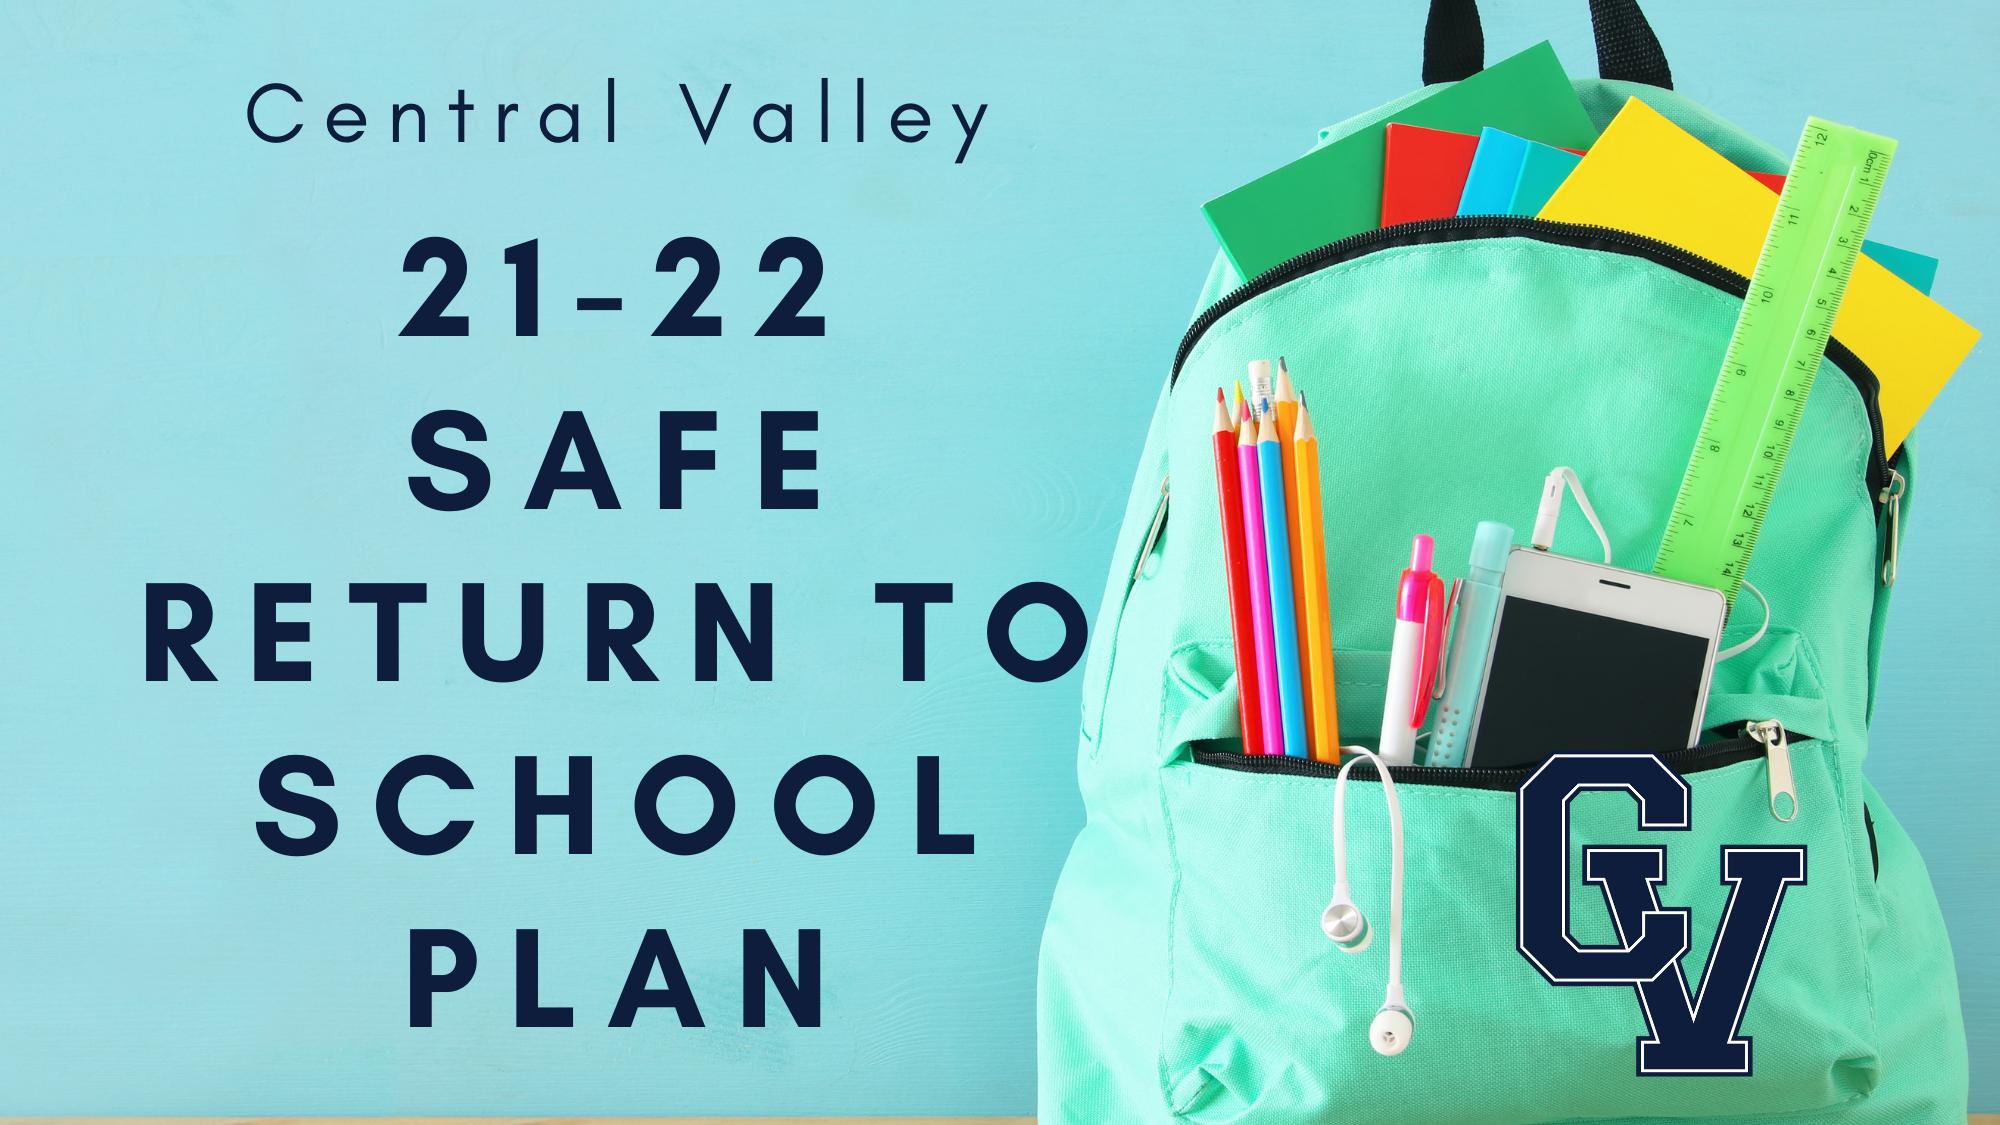 Safe Return To School Plan